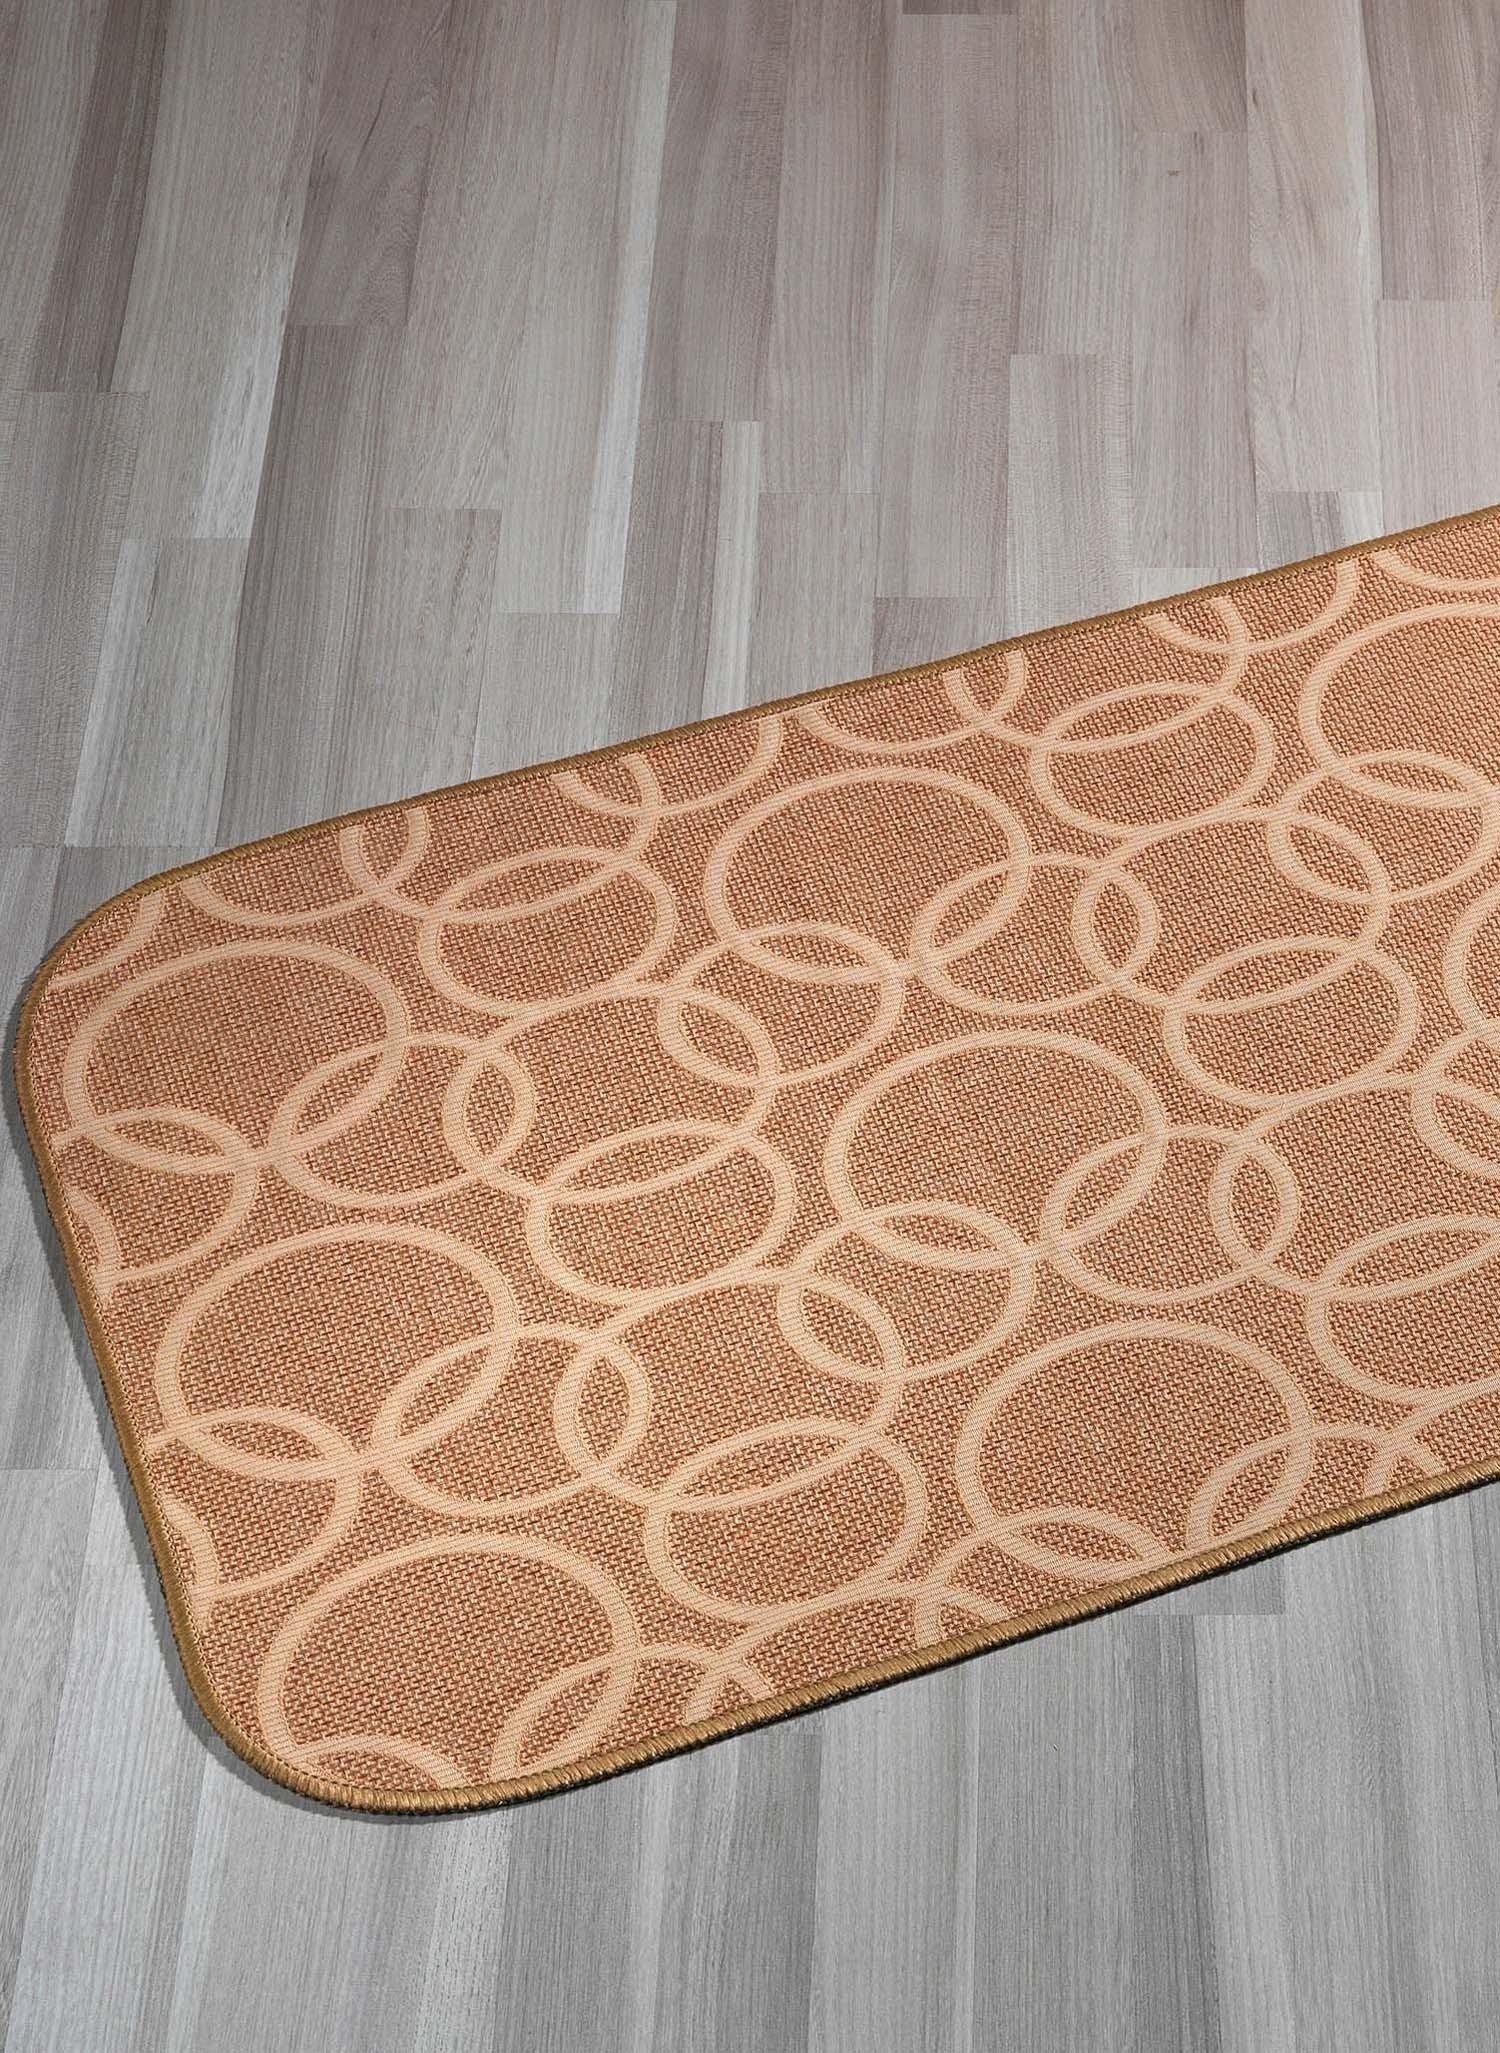 "Teppich""RINGE""beige 57x115 - 1 - Ronja.ch"